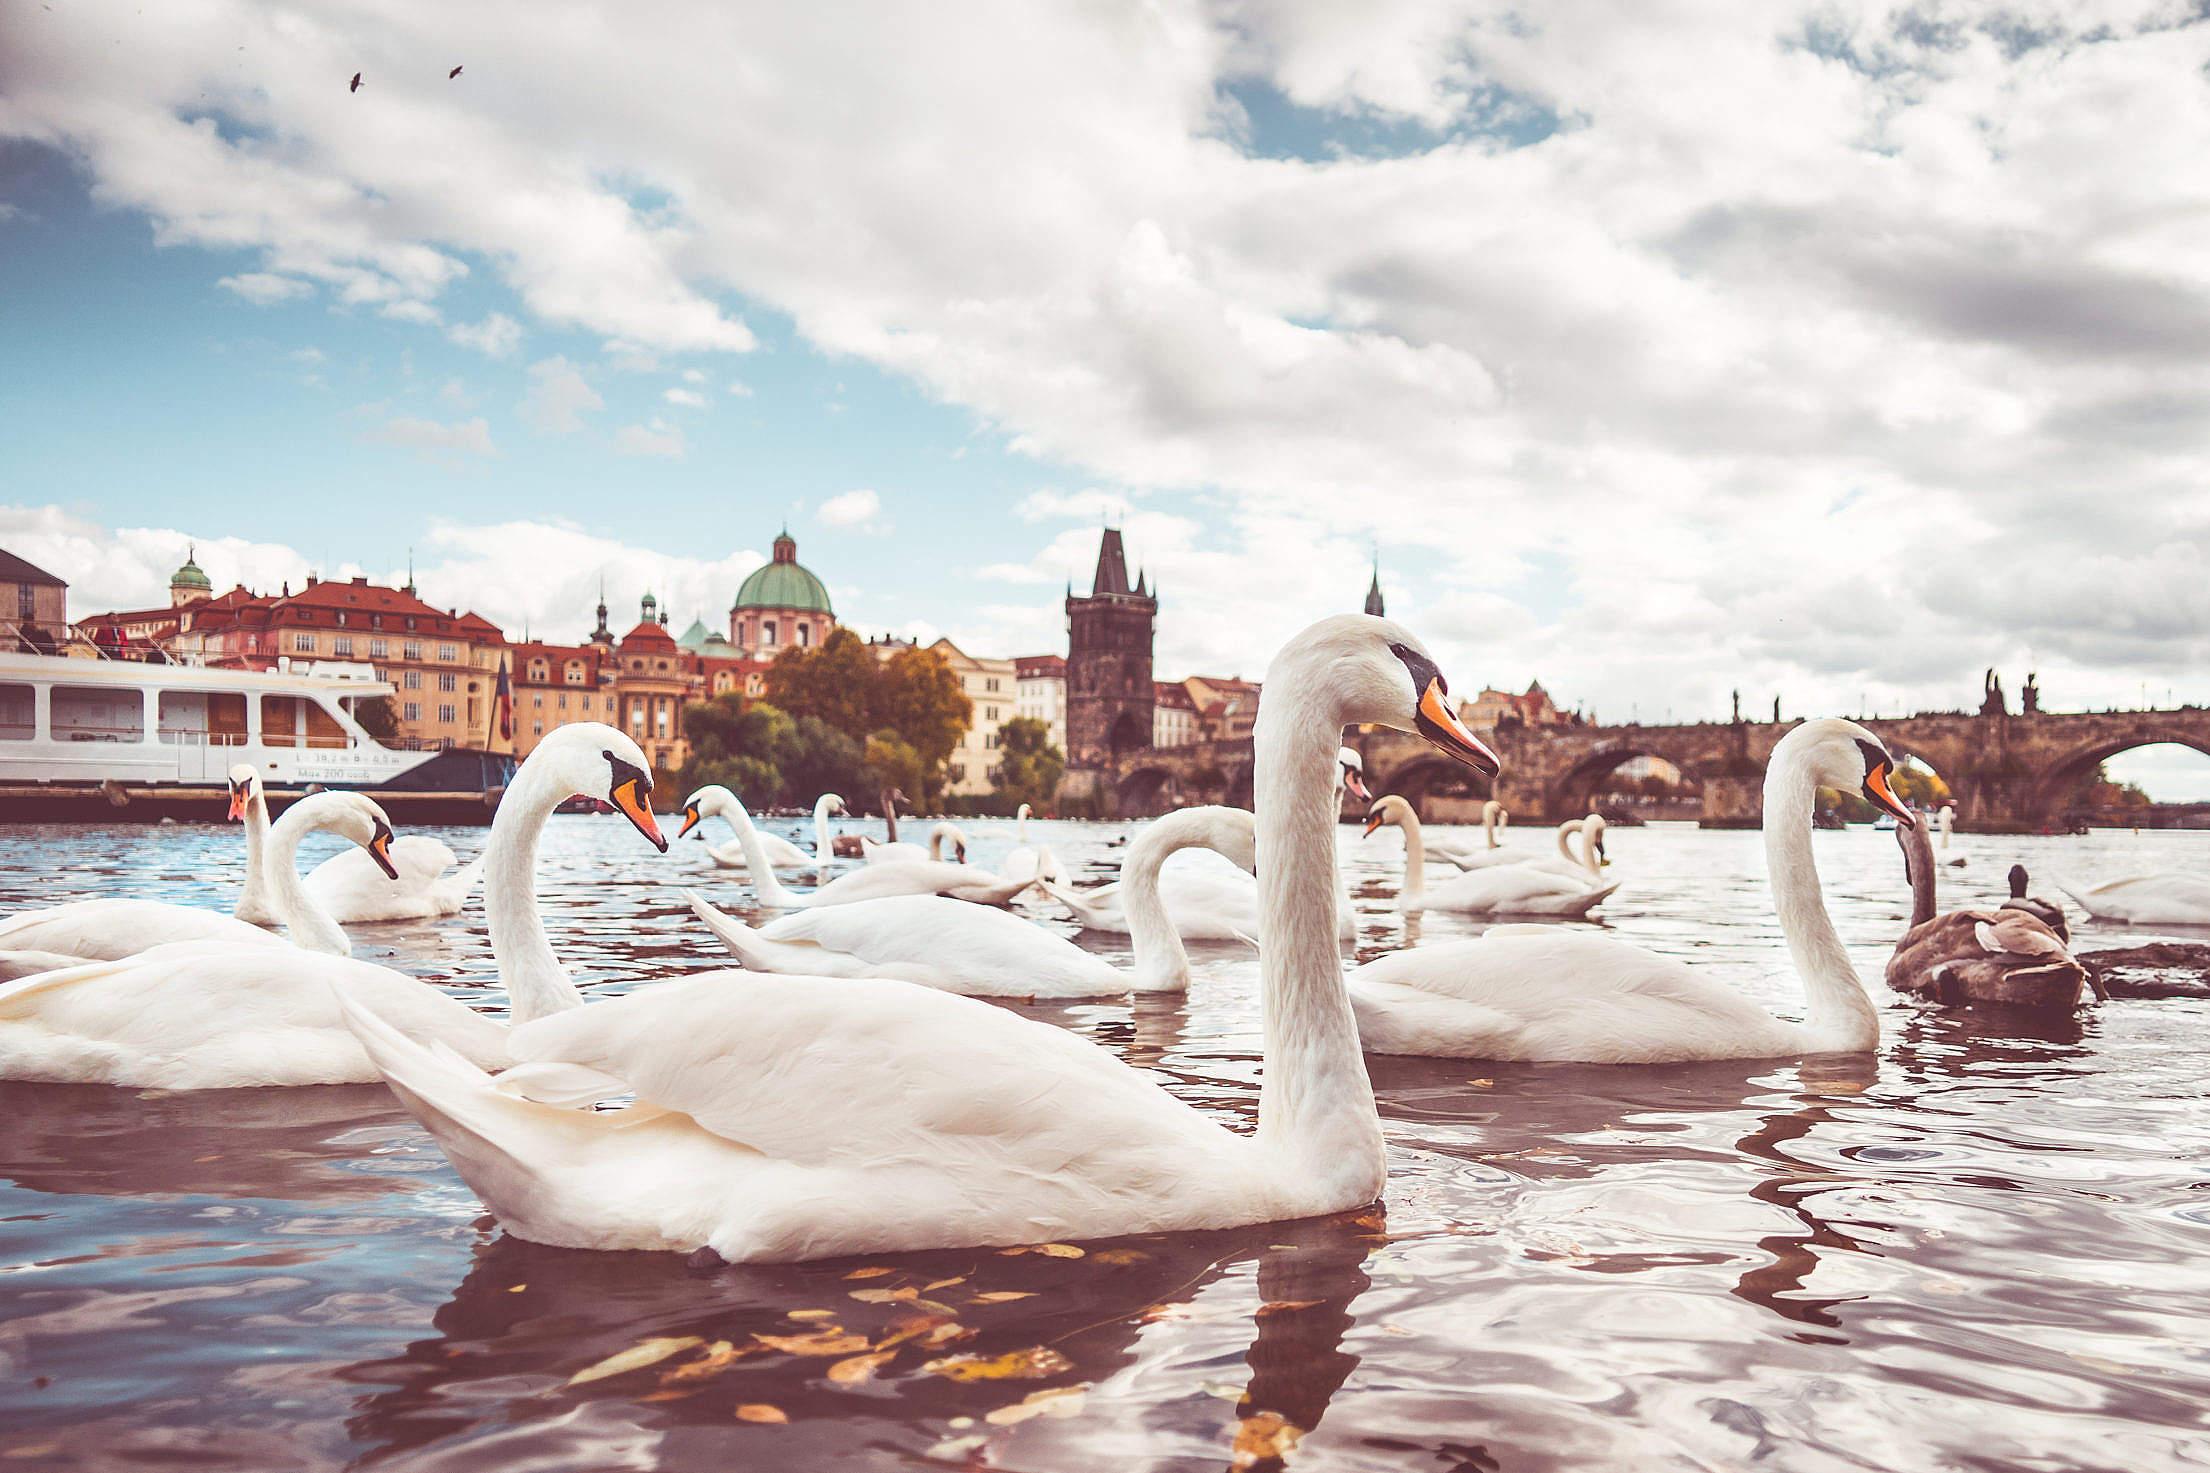 White Swans near Charles Bridge in Prague #2 Free Stock Photo